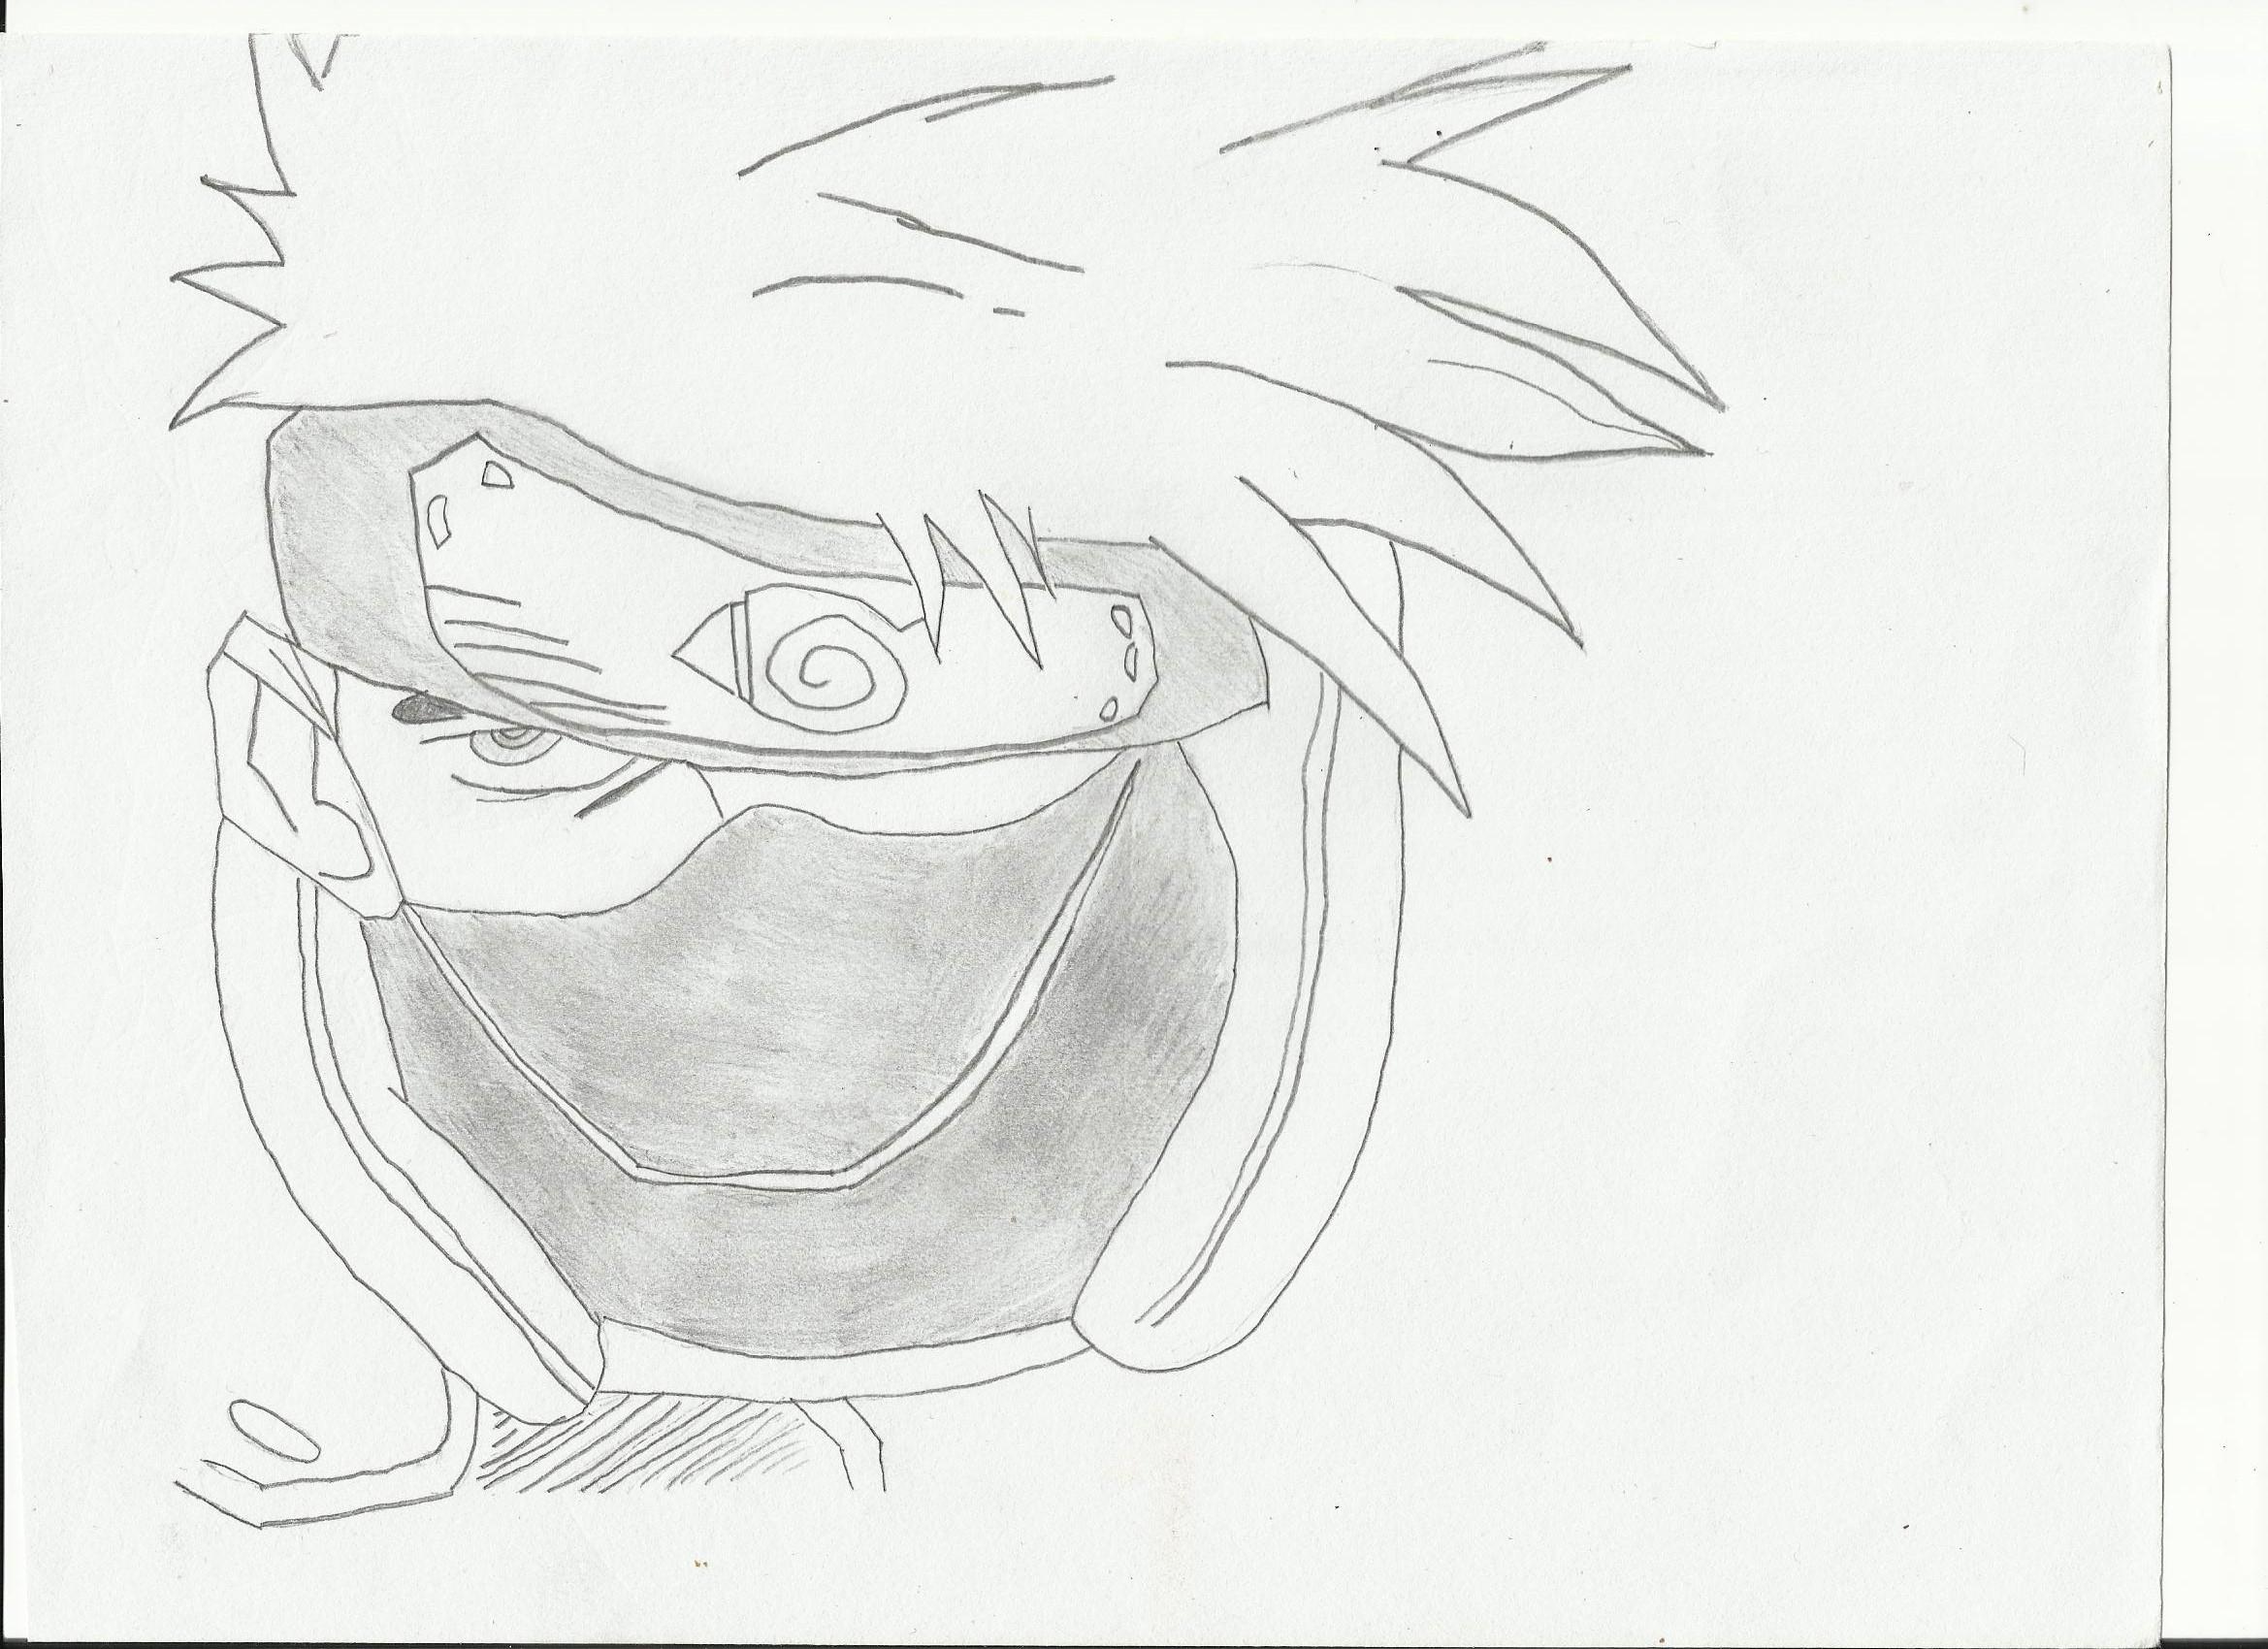 2338x1700 Graffiti Character Naruto Naruto Shippuden, Pain Drawing